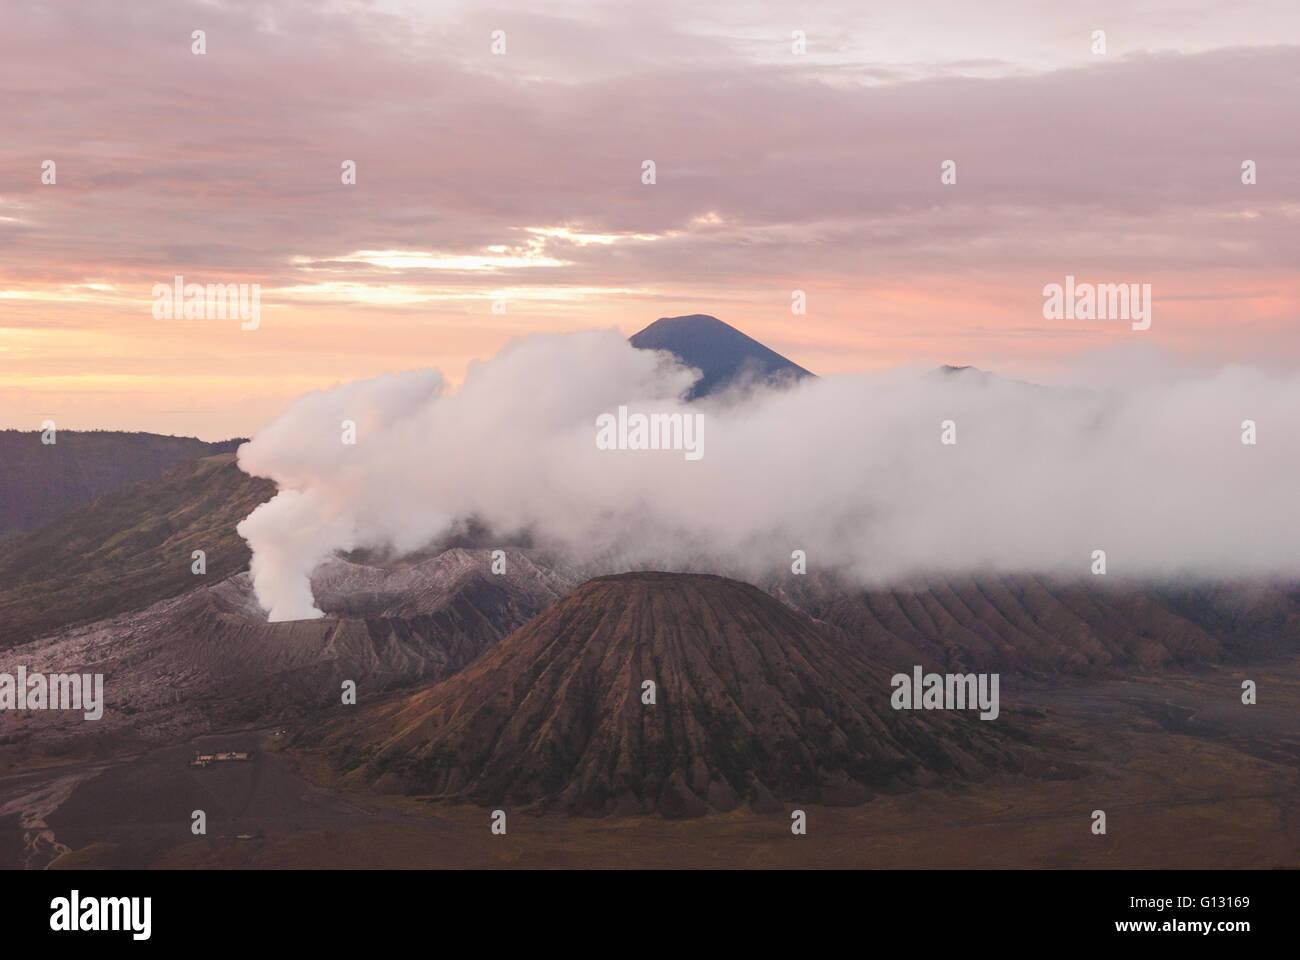 Sunrise over Mt. Bromo in eastern Java - Stock Image